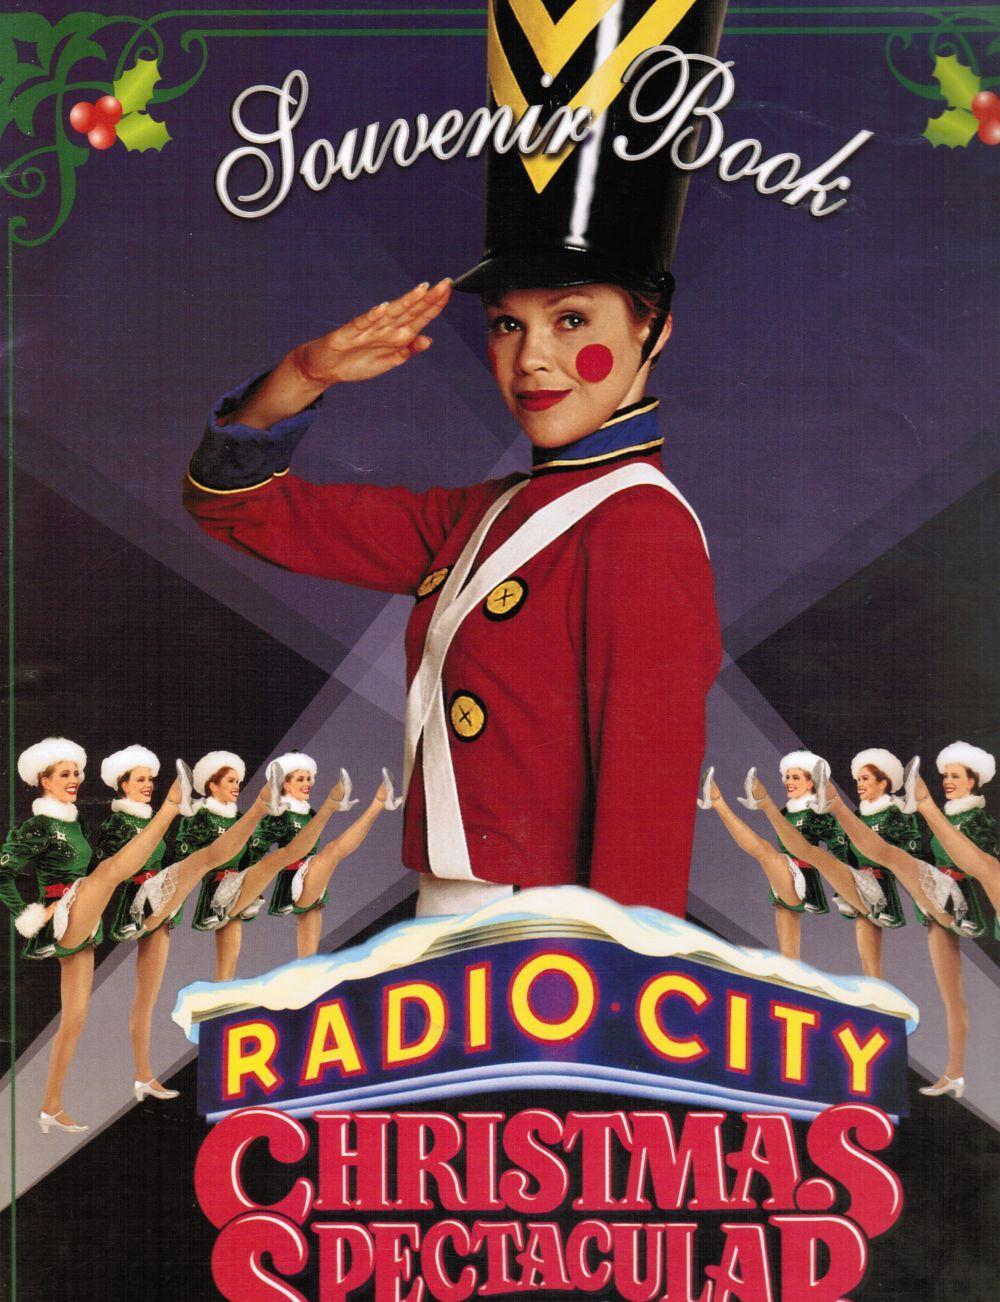 Radio City, Christmas Spectacular, Starring